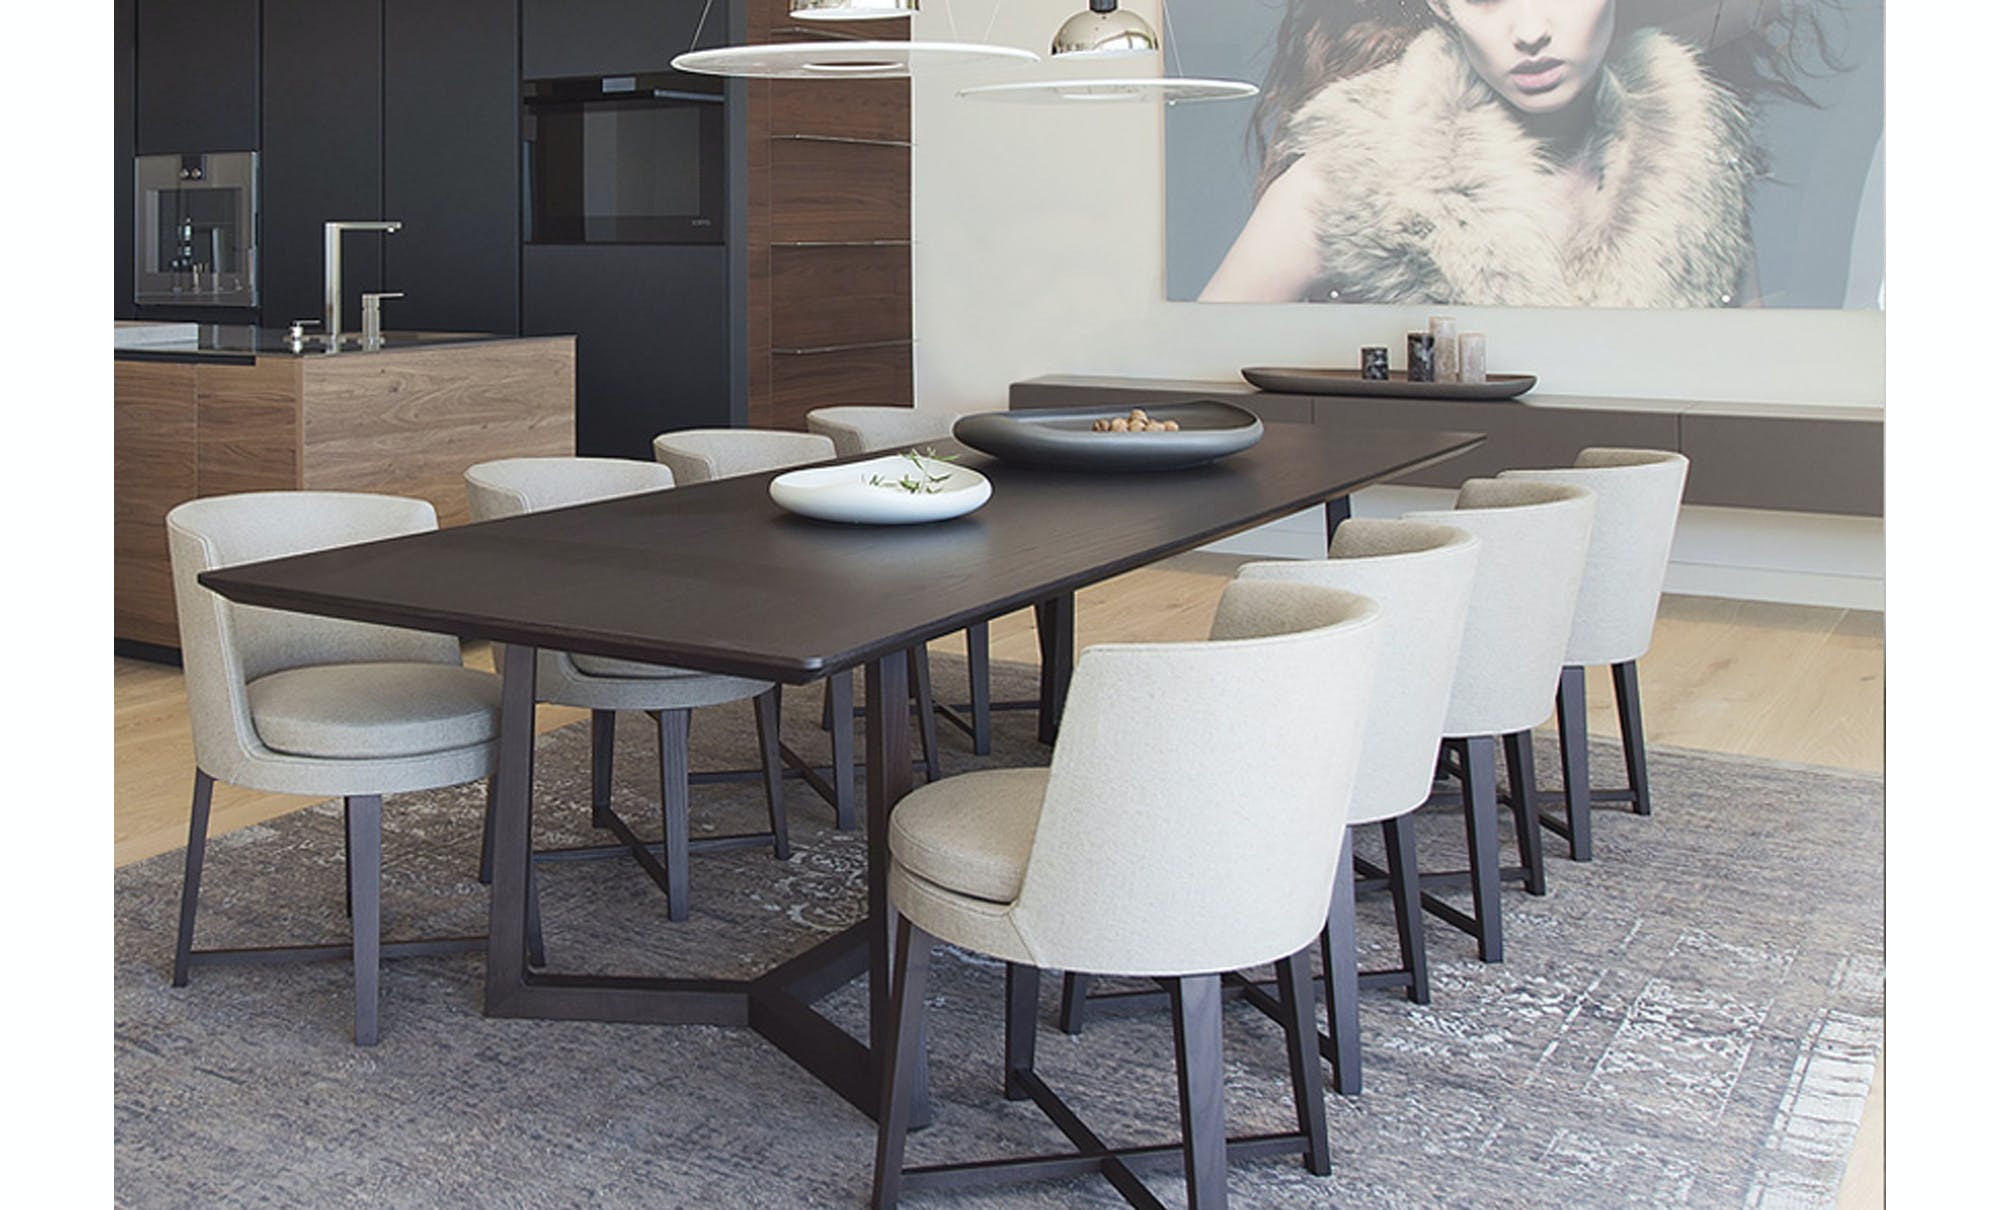 Jiff Table   Coffee Table or Dining Table   Fanuli Furniture